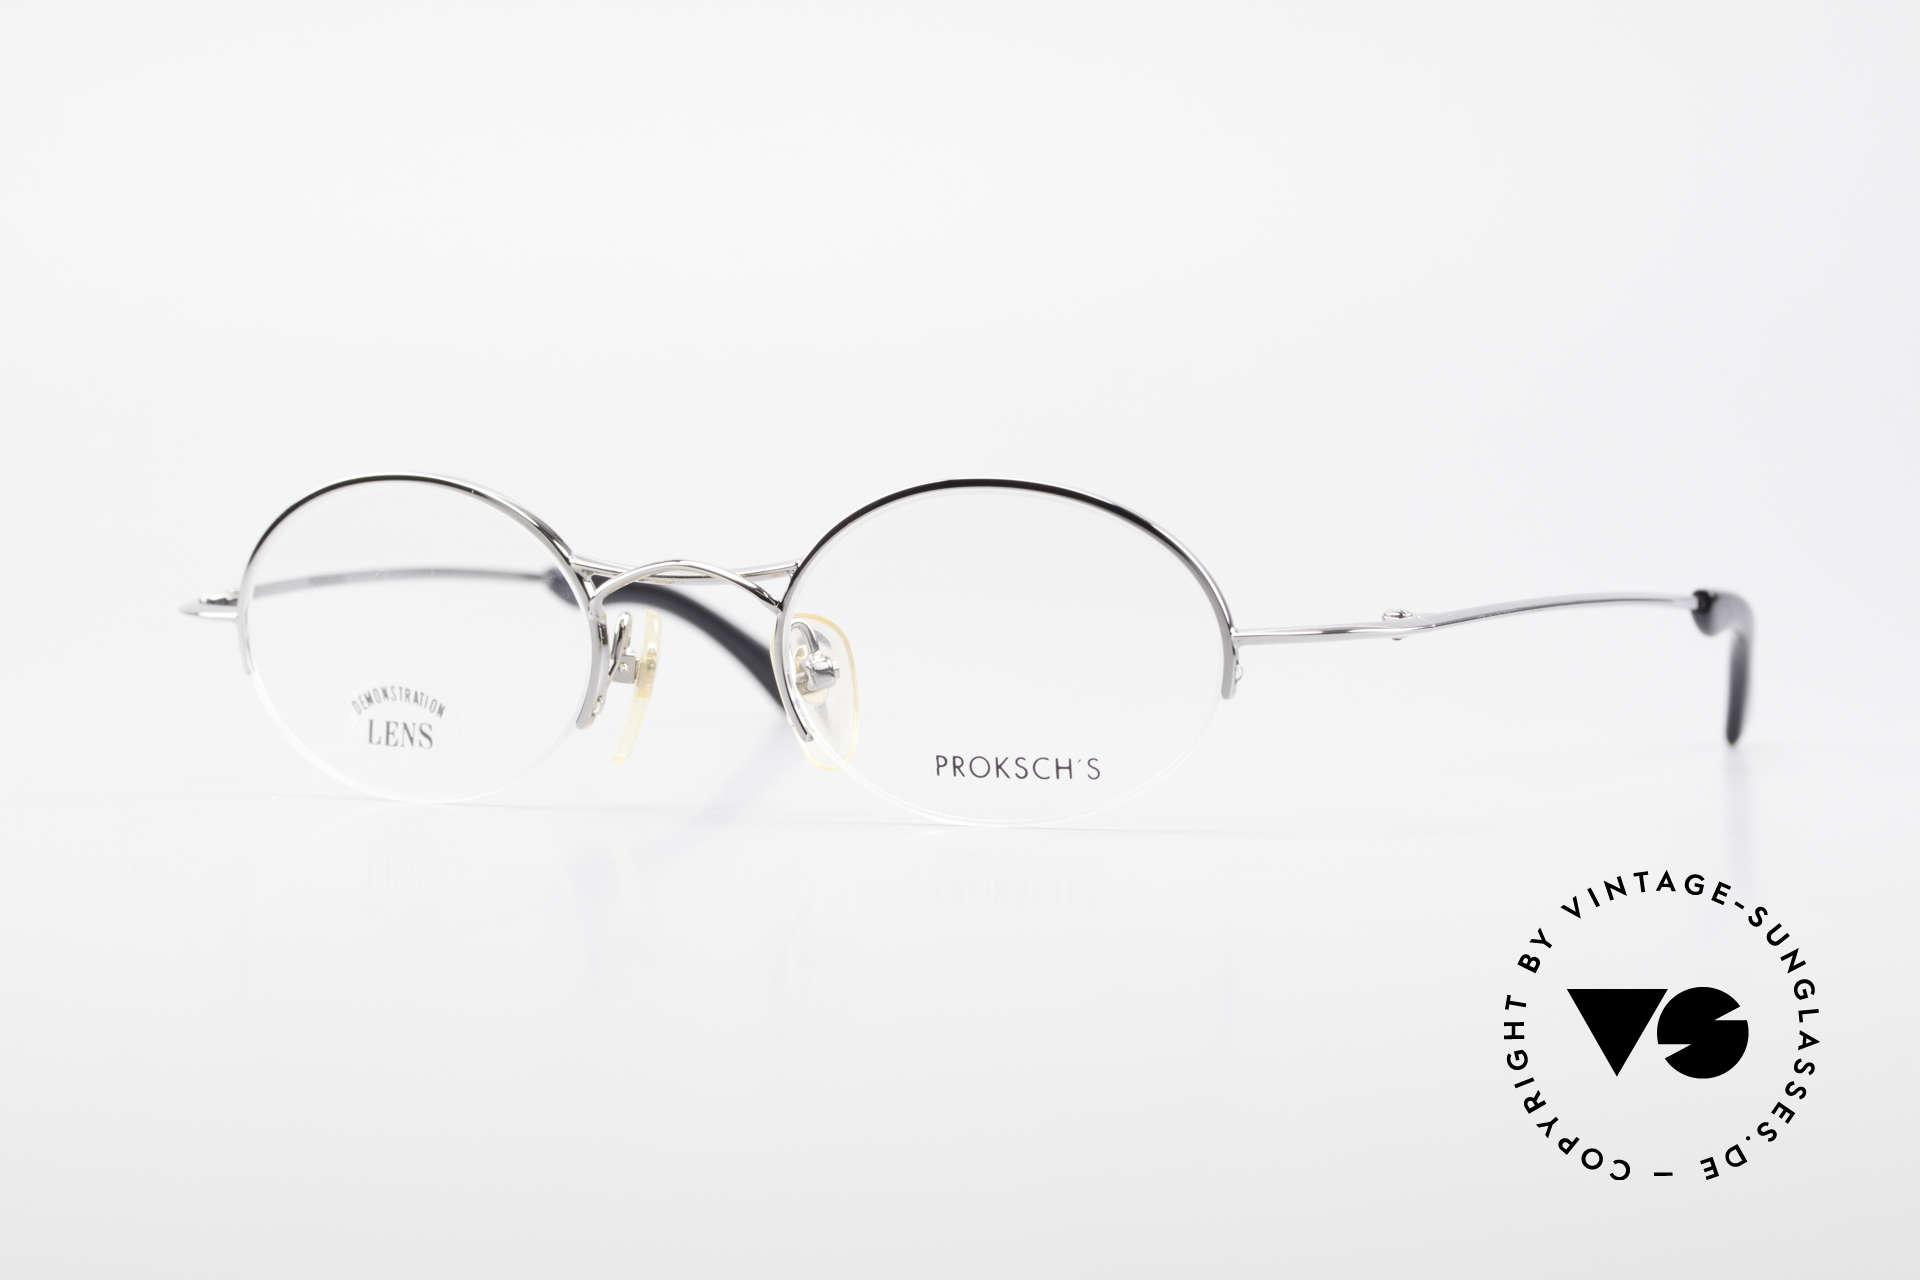 W Proksch's M35/2 Semi Rimless 90's Avantgarde, oval vintage eyeglasses by Proksch's from 1995/96, Made for Men